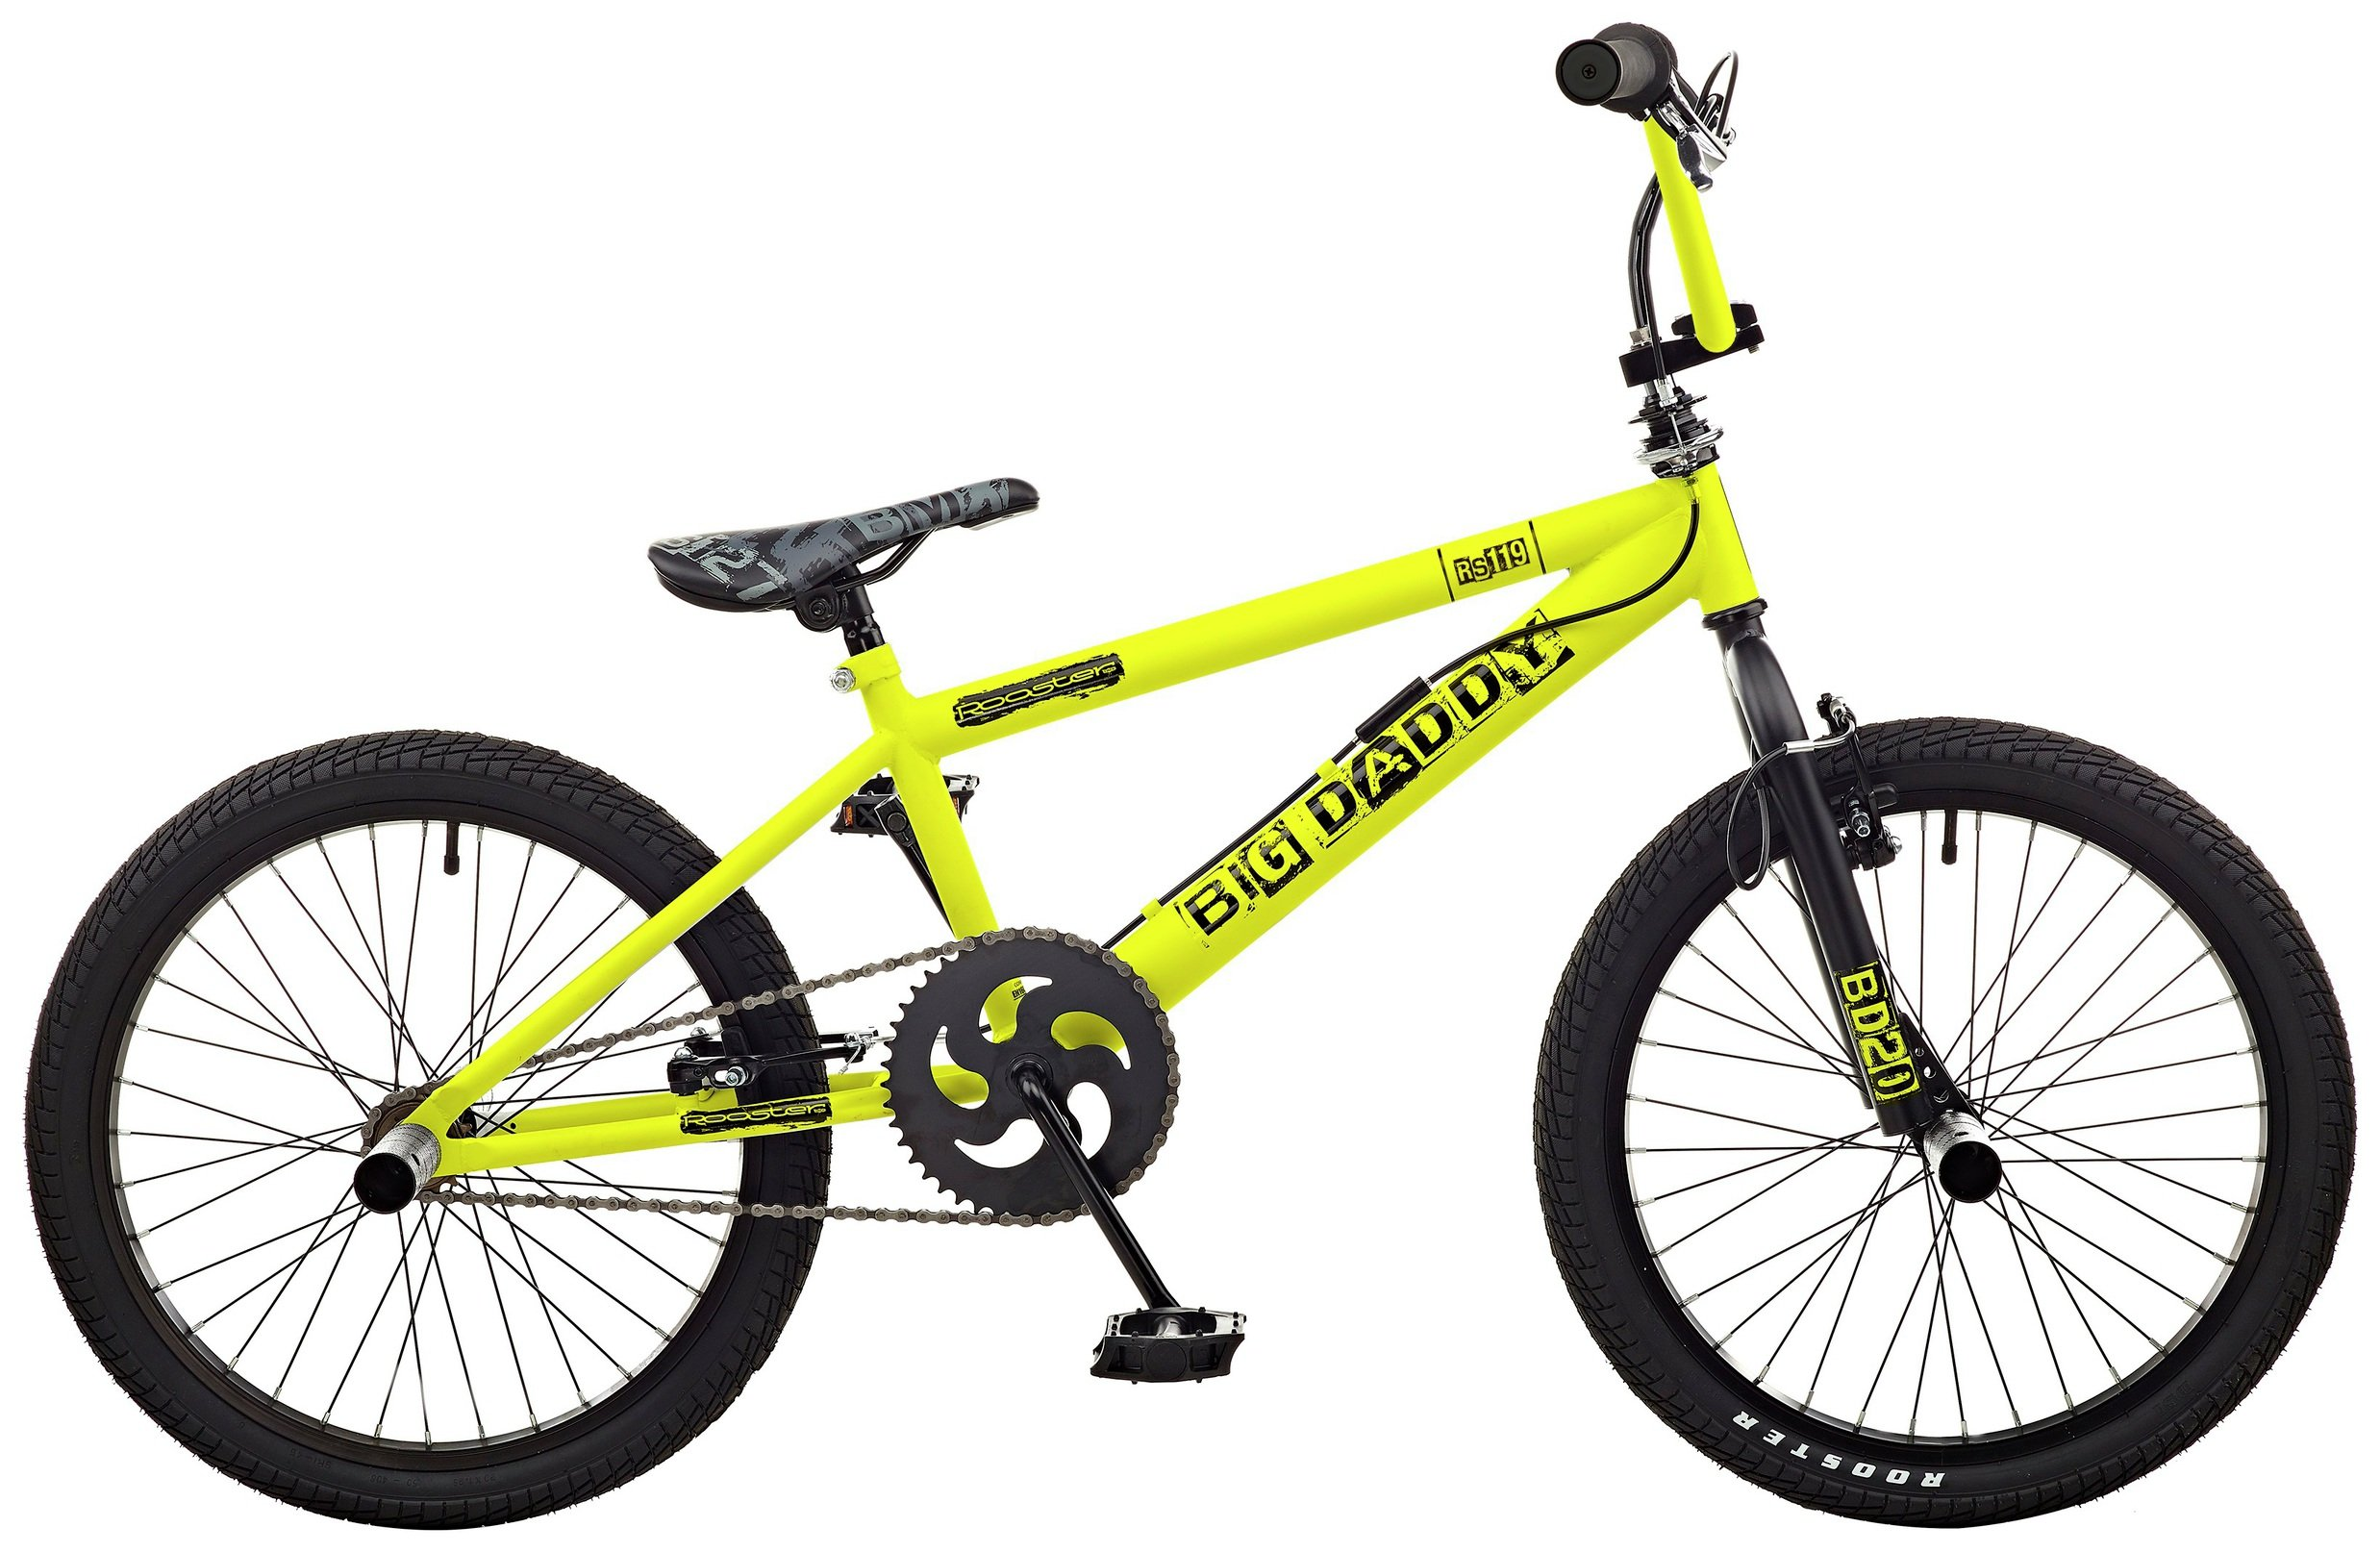 'Rooster Big Daddy 20 Bmx Bike - Yellow & Black